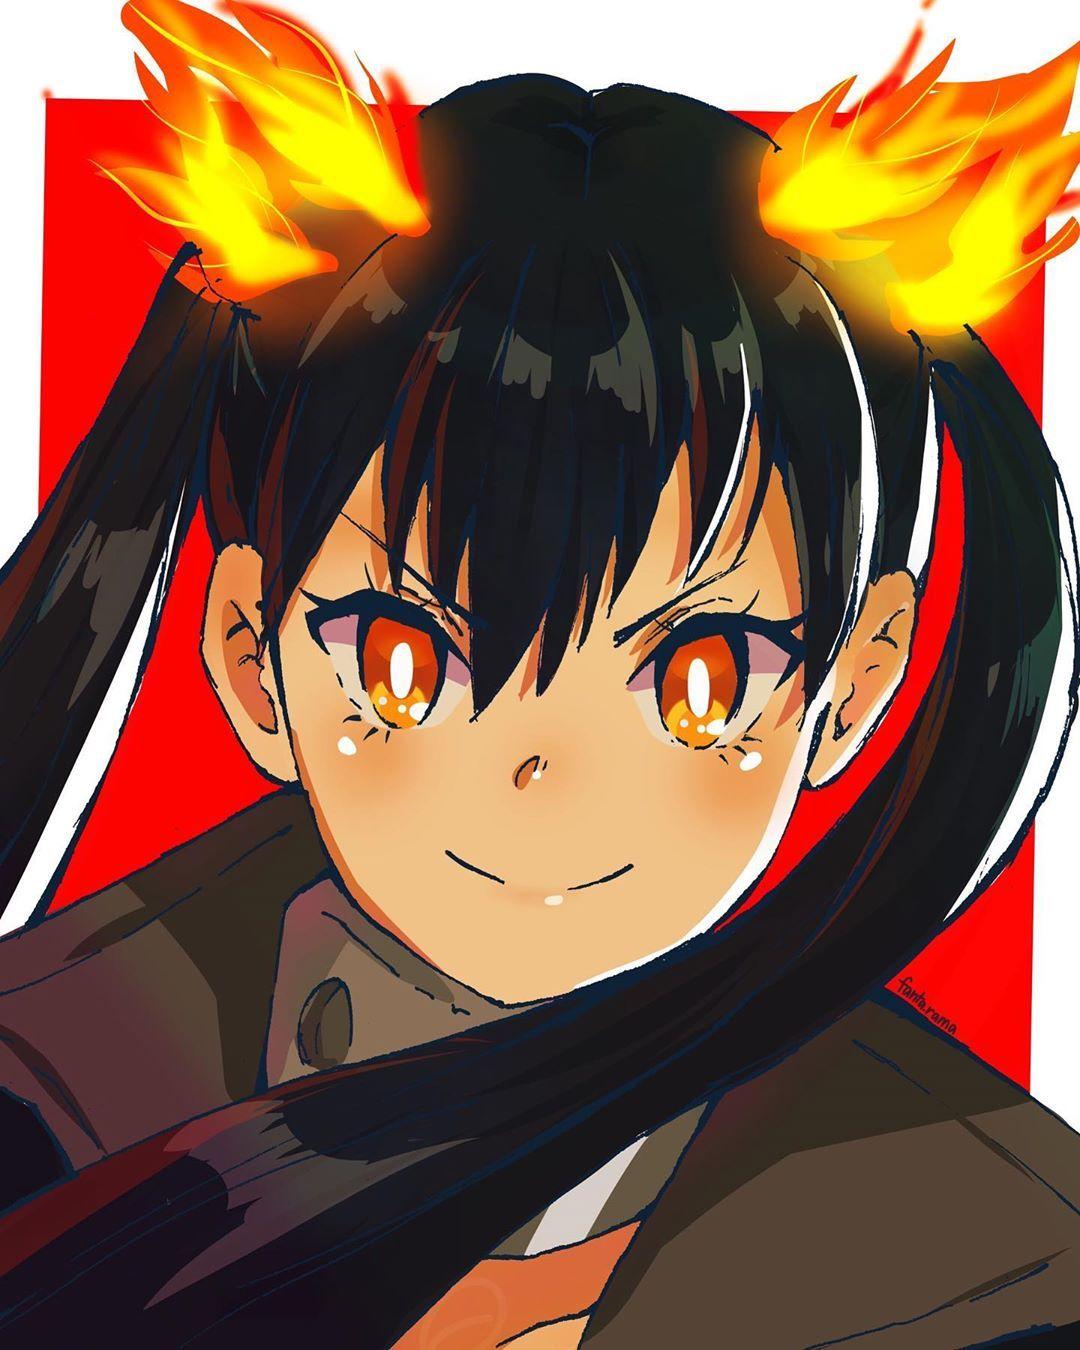 Pin on Anime/Manga.